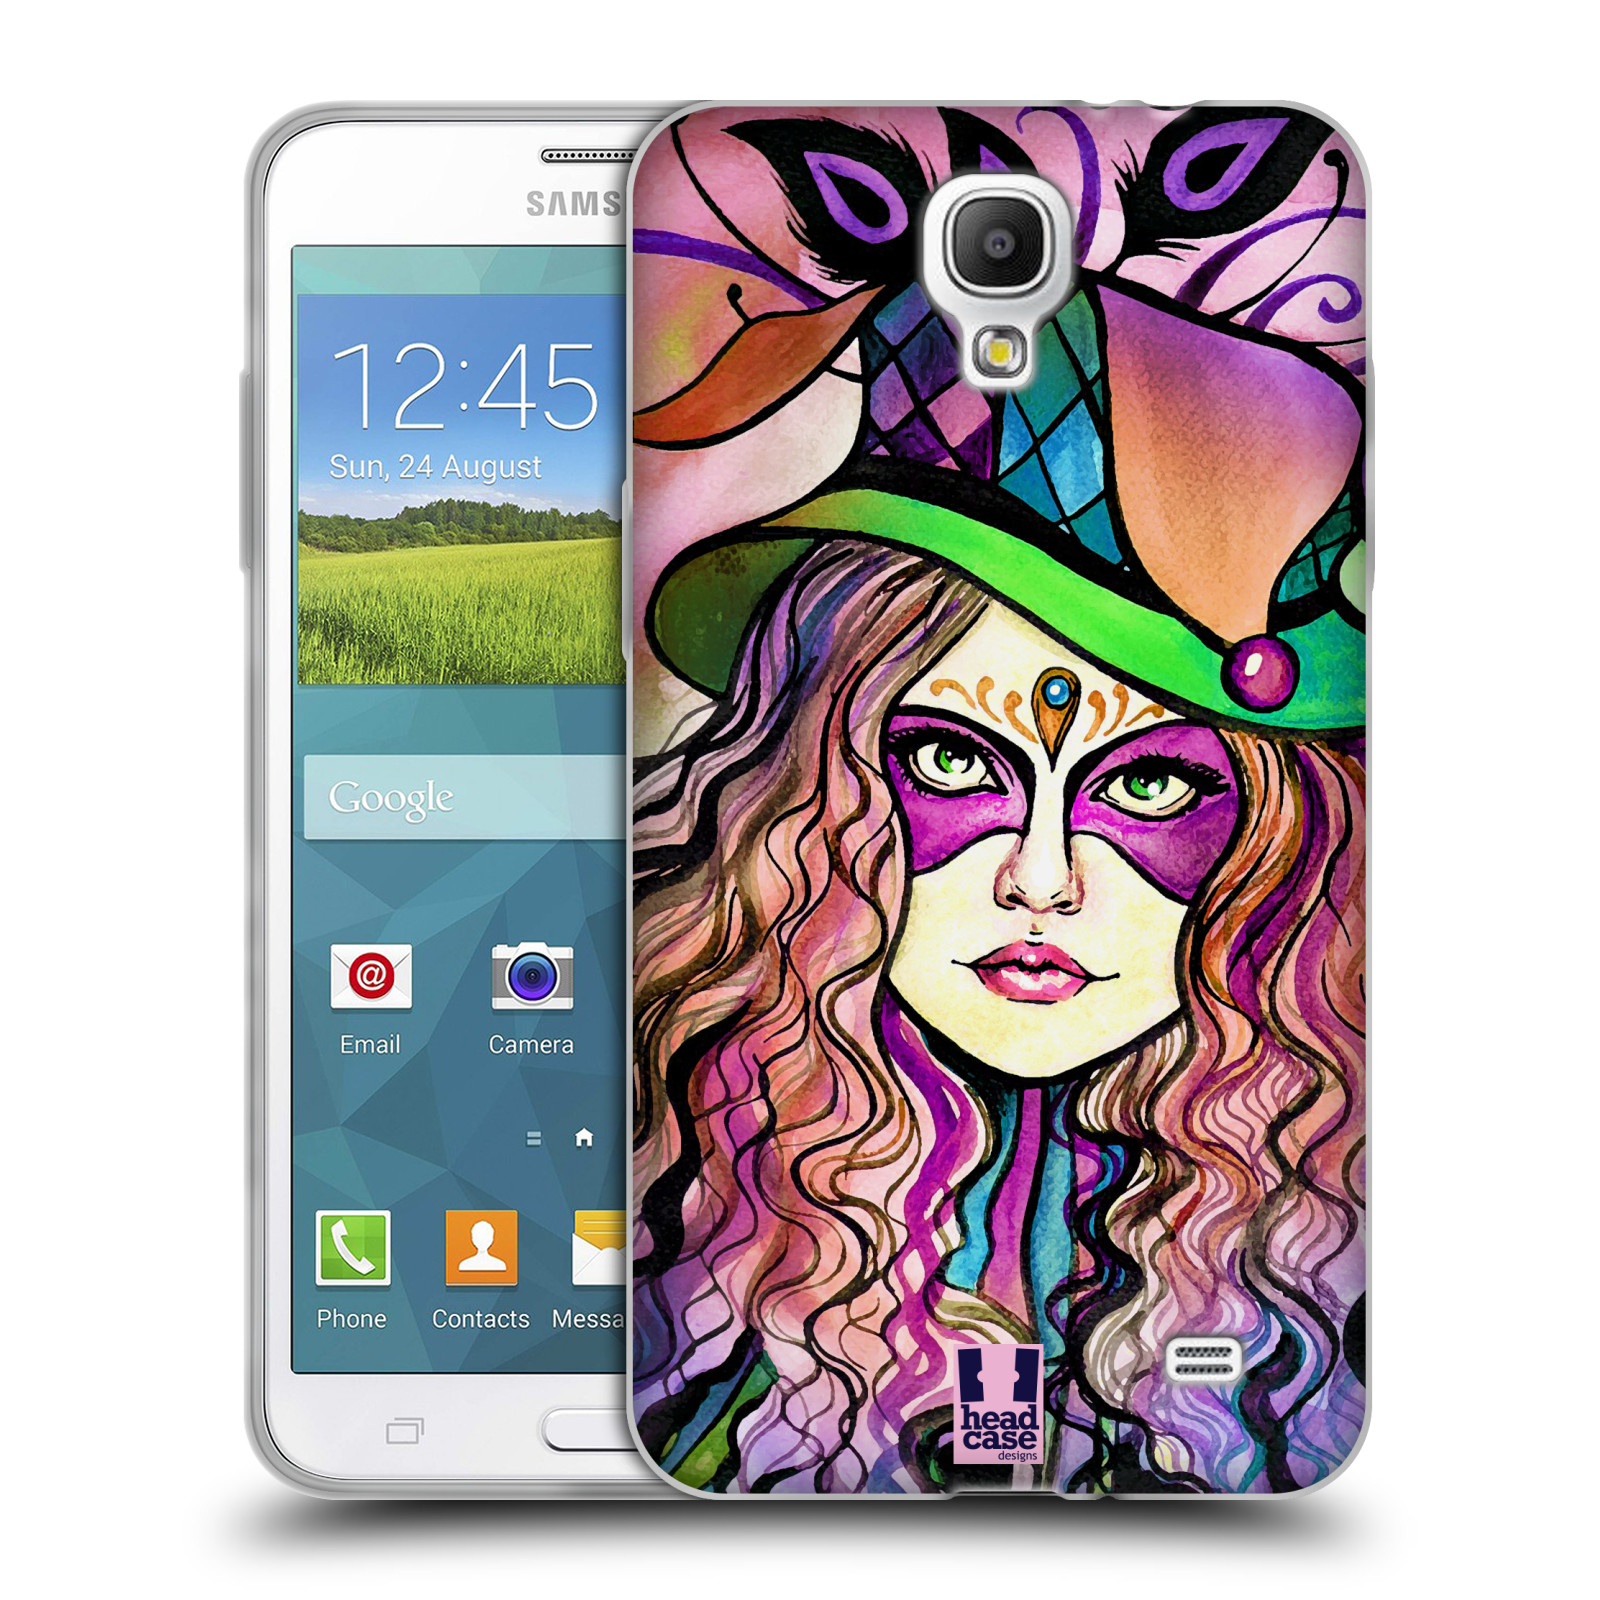 HEAD CASE silikonový obal na mobil Samsung Galaxy Mega 2 vzor Maškarní ples masky kreslené vzory KLOBOUK